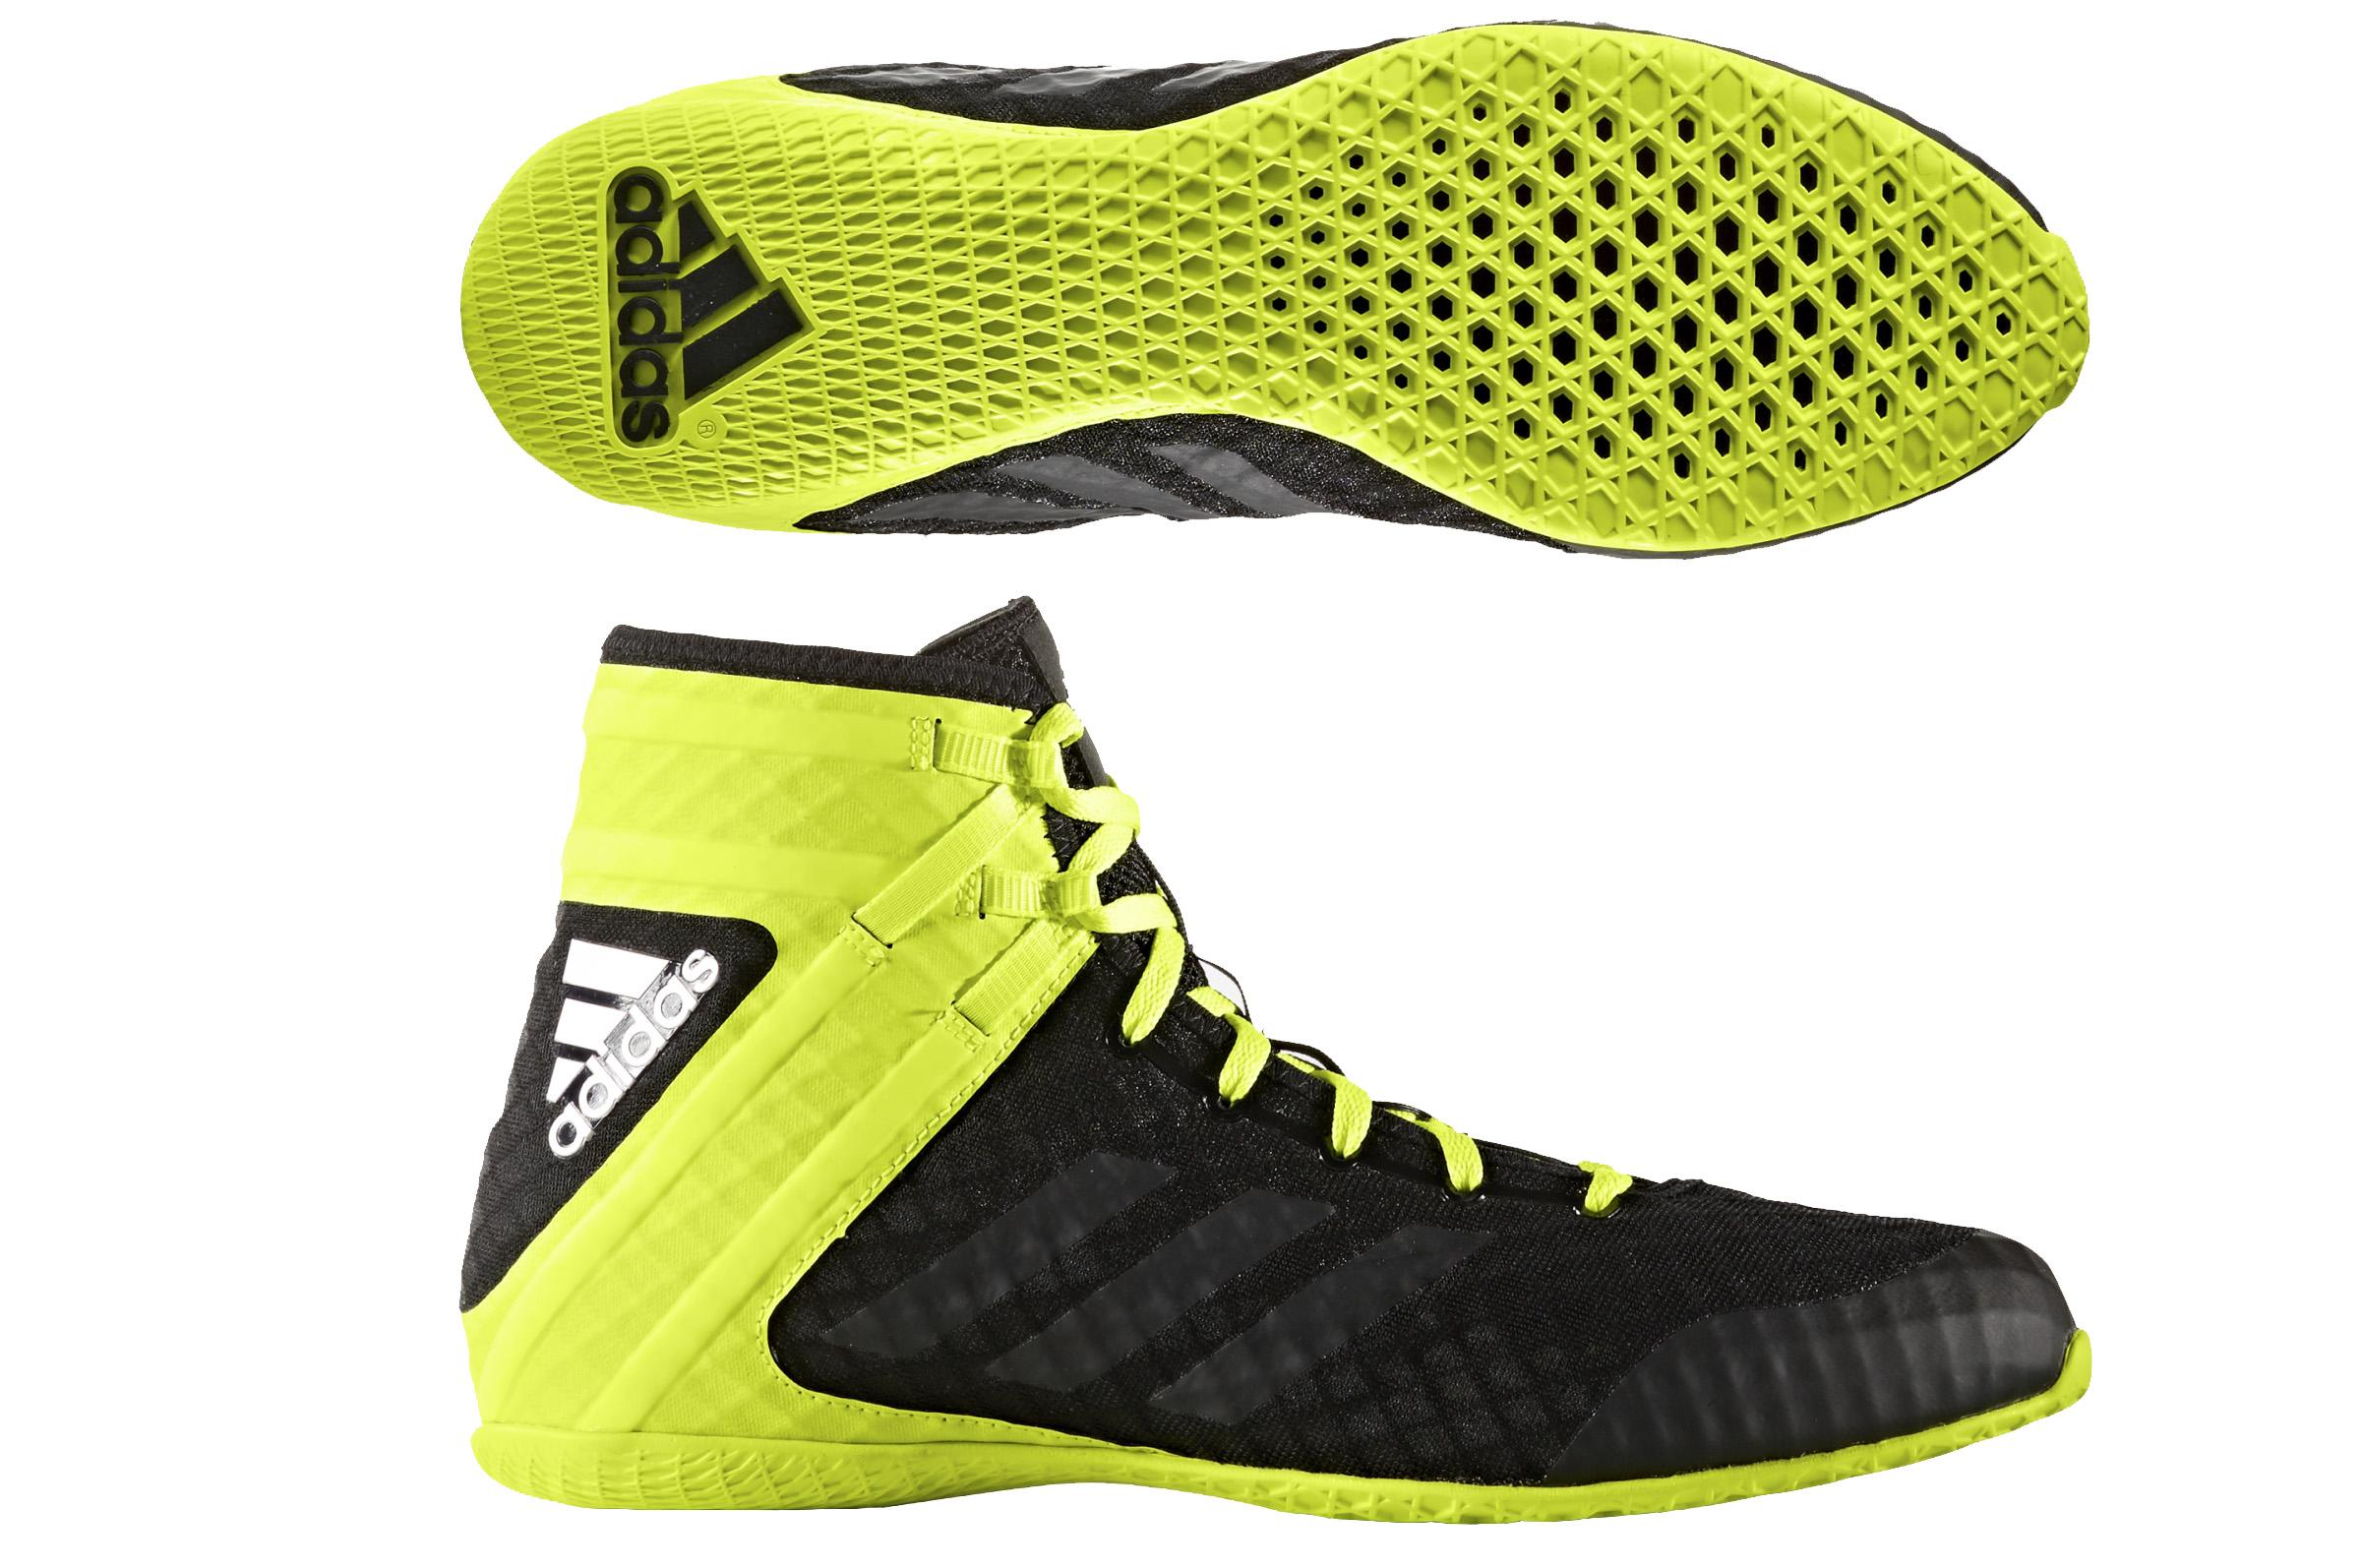 new products dac9c d1dda Zapatos de boxeo Inglés Speedex 16.1, AQ3408, Adidas ...